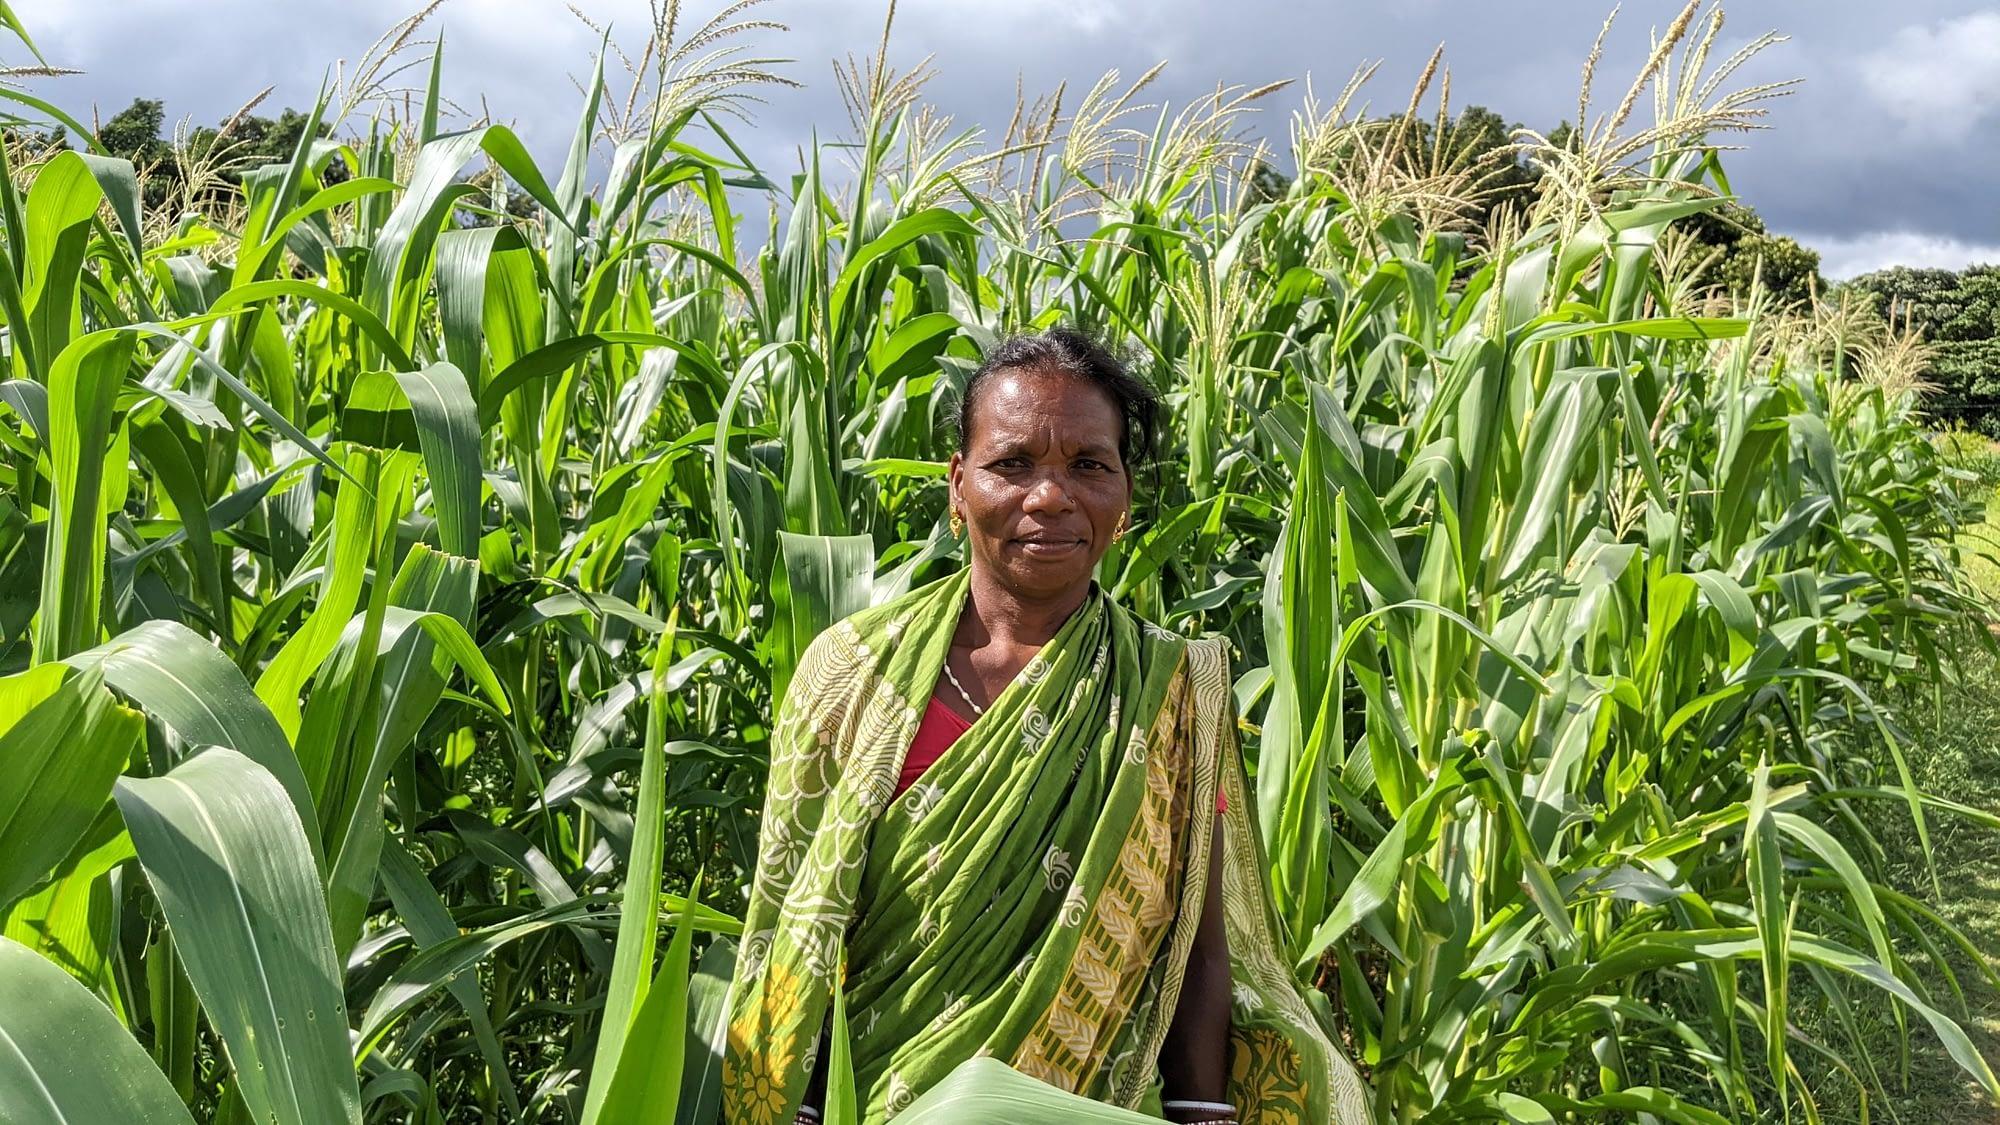 Farmer Anita Naik stands for a photograph next to her maize field. (Photo: Nima Chodon/CIMMYT)